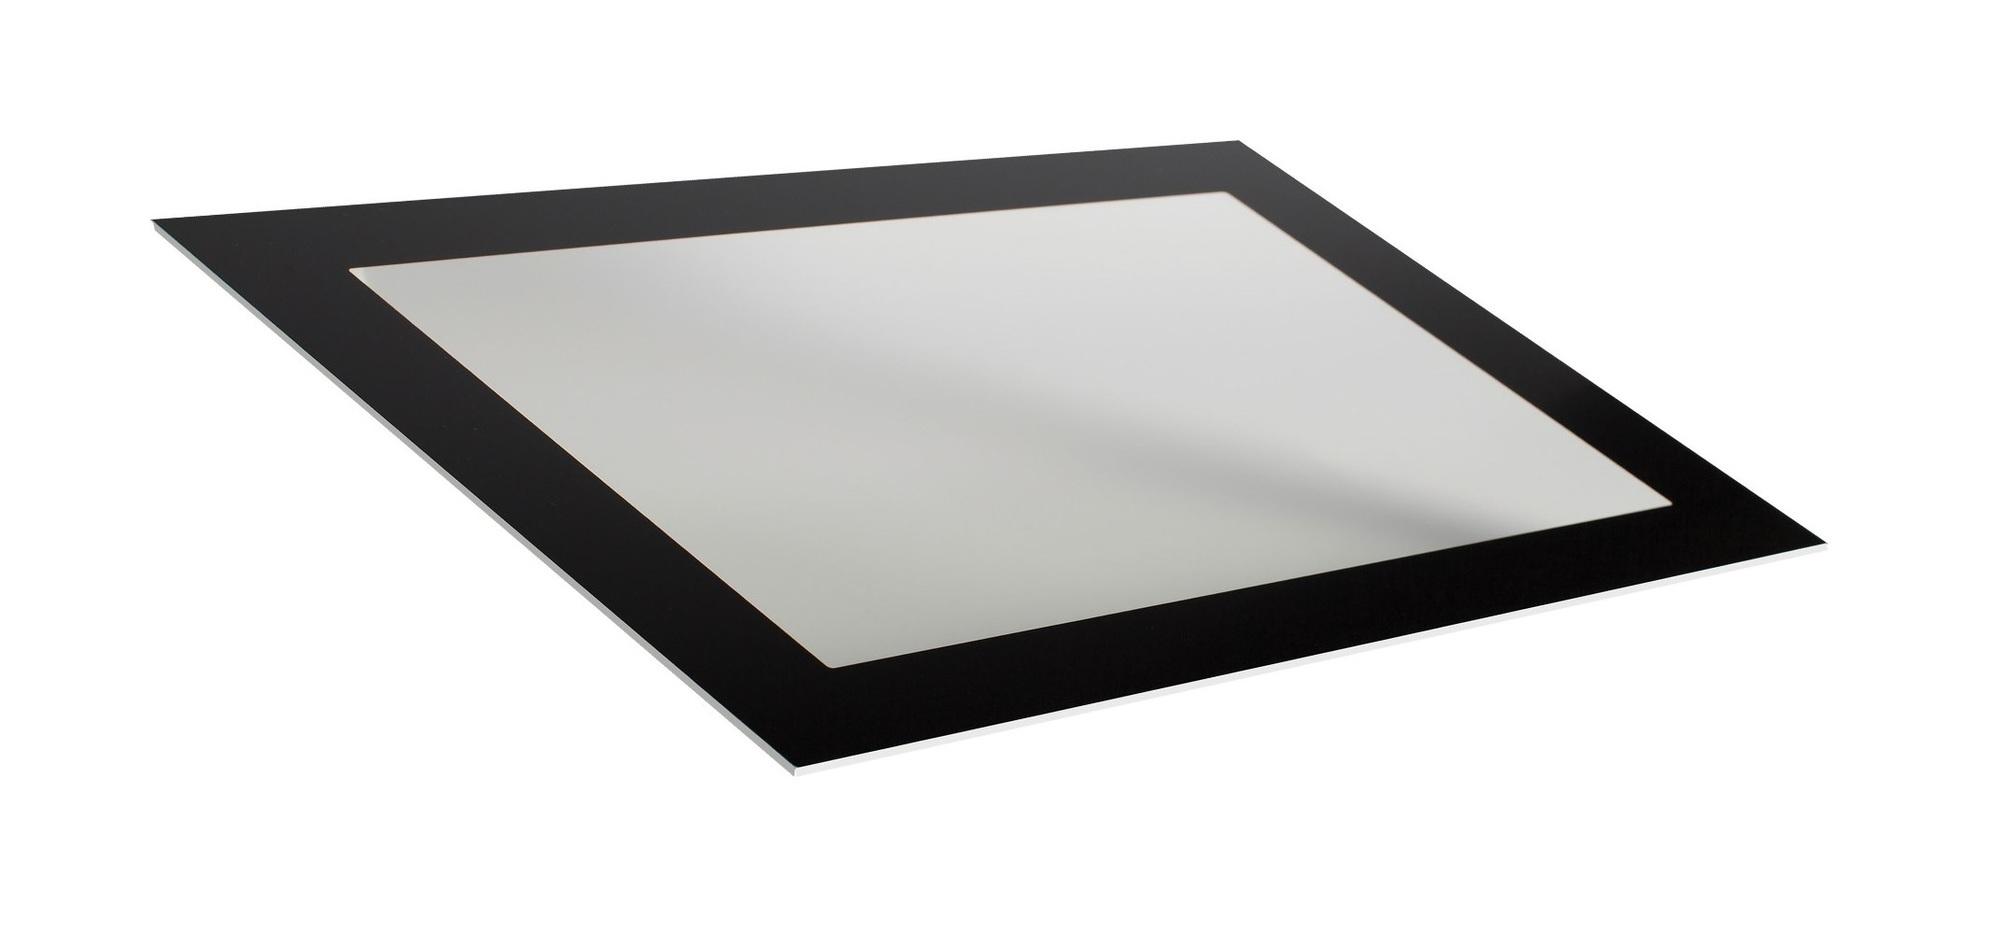 Lackierter Metall-Frontrahmen mit integriertem Touchscreen